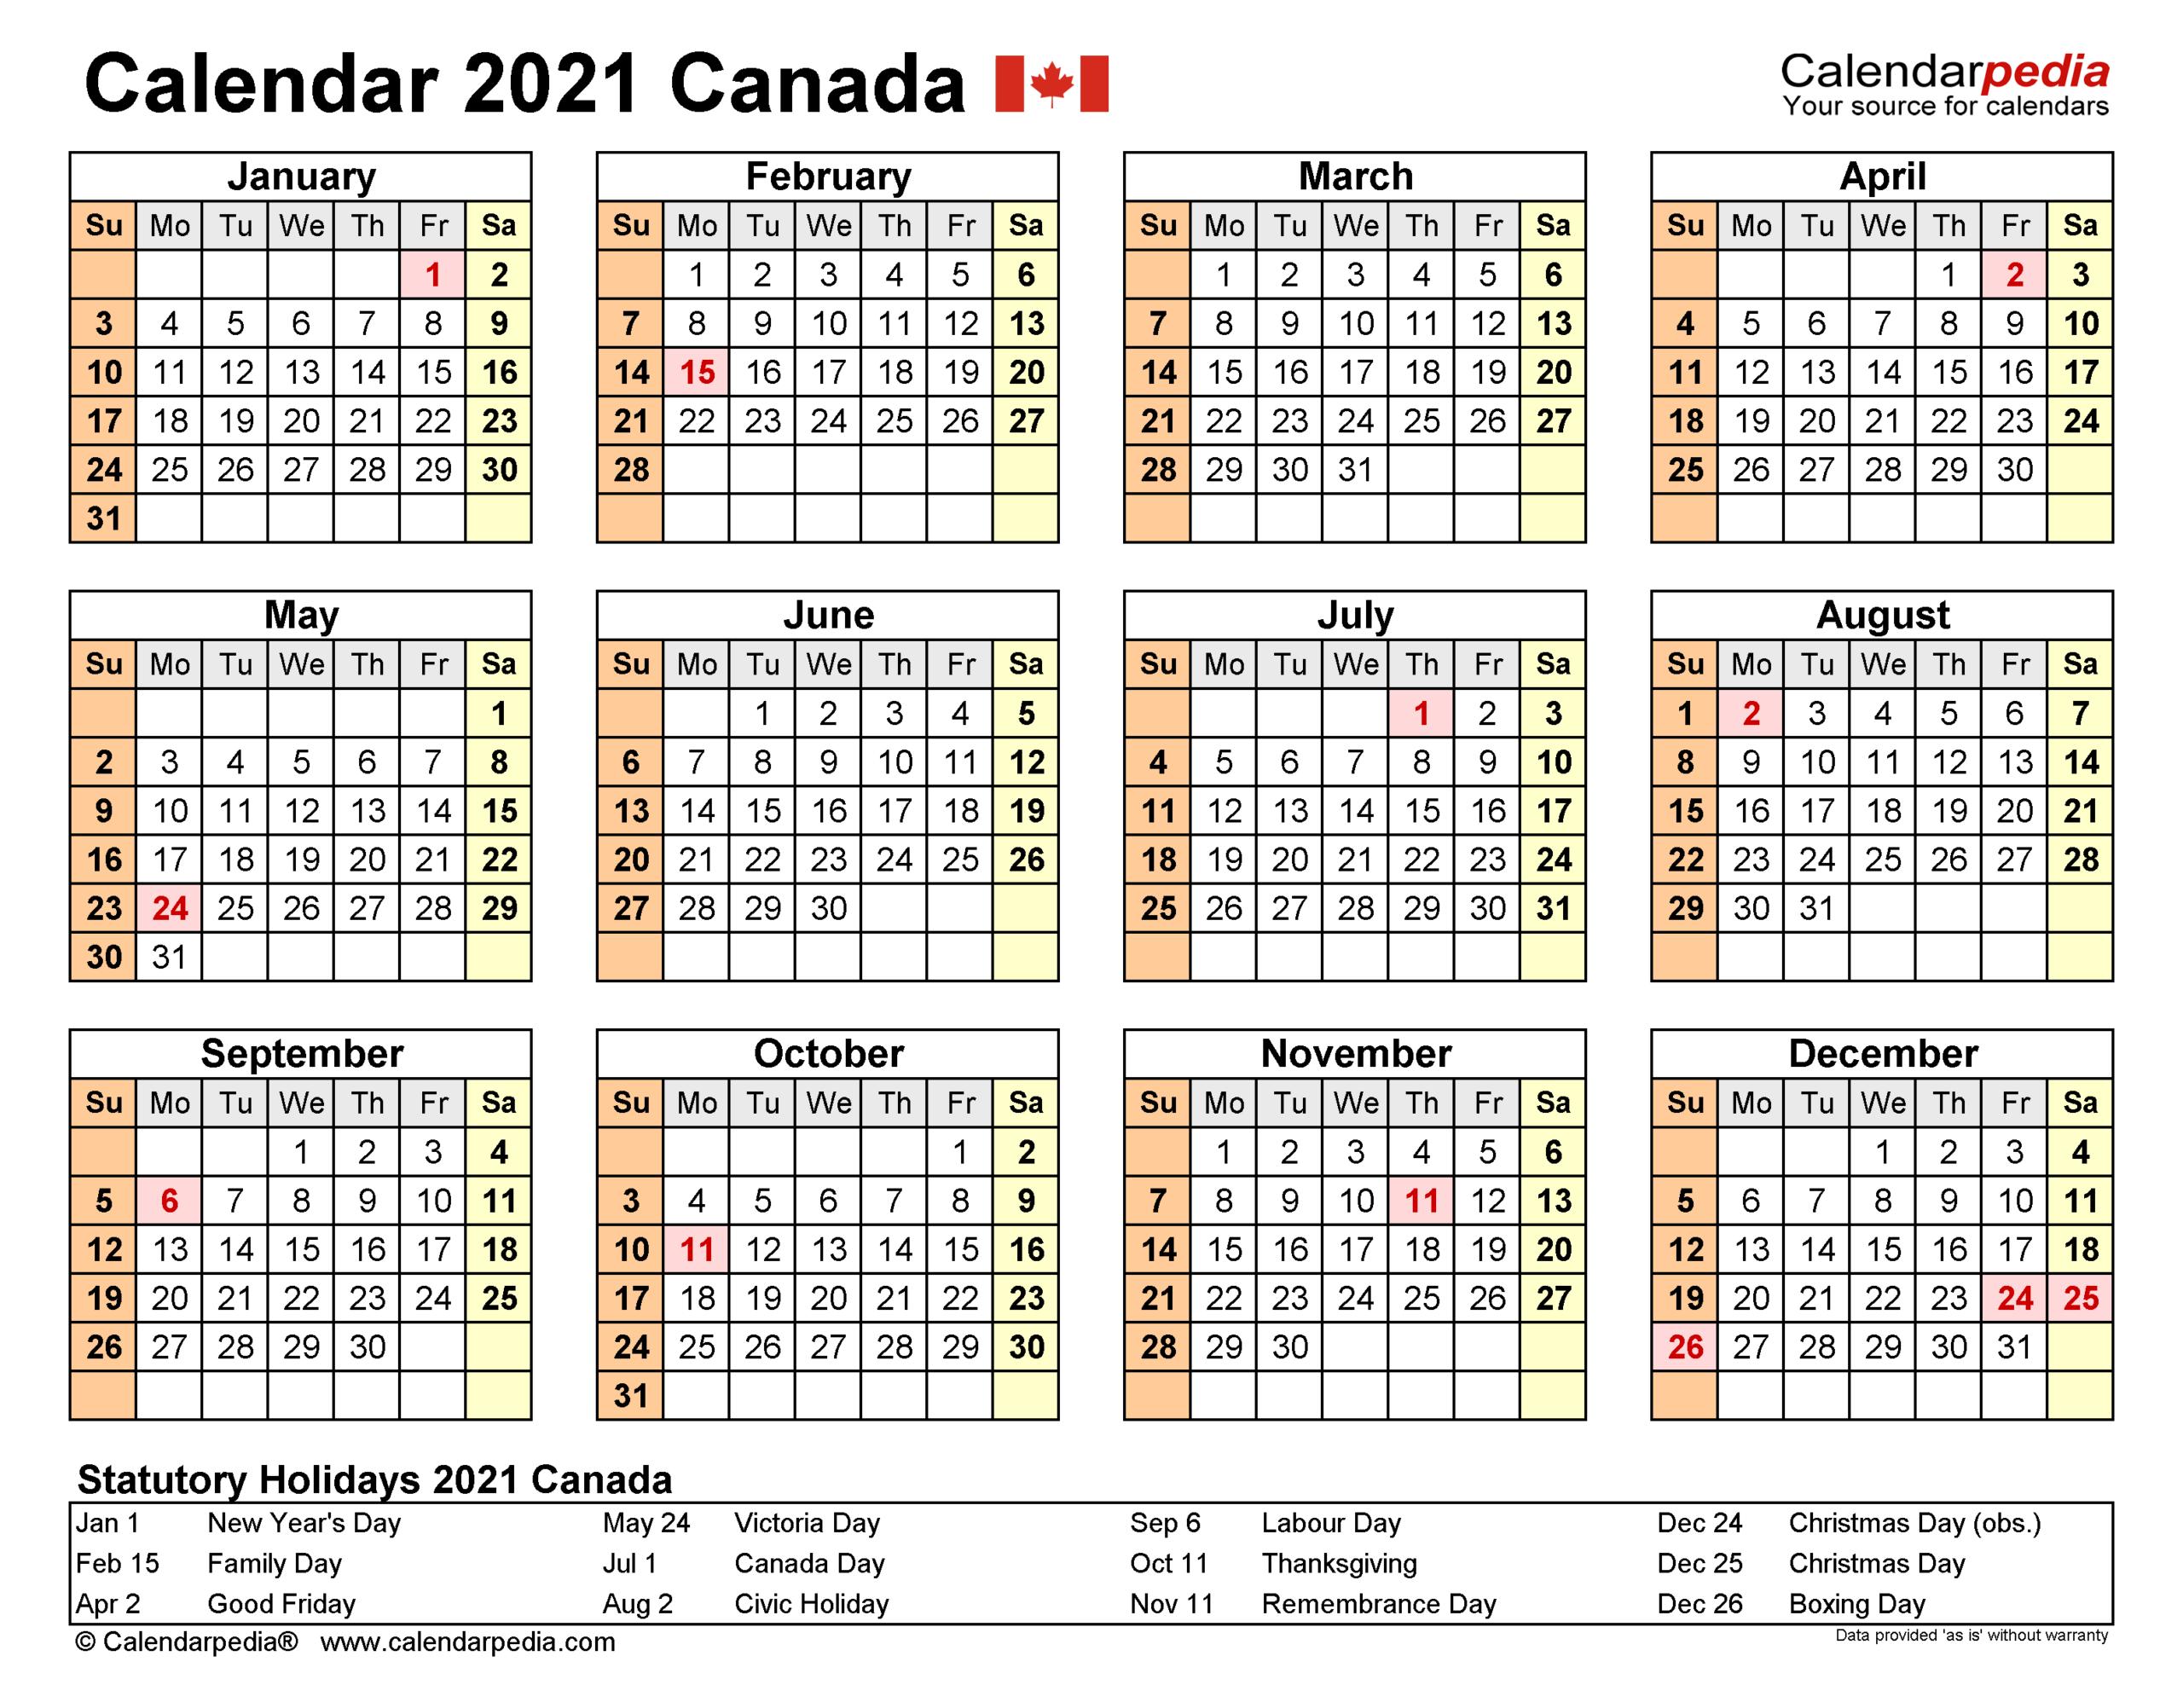 Canada Calendar 2021